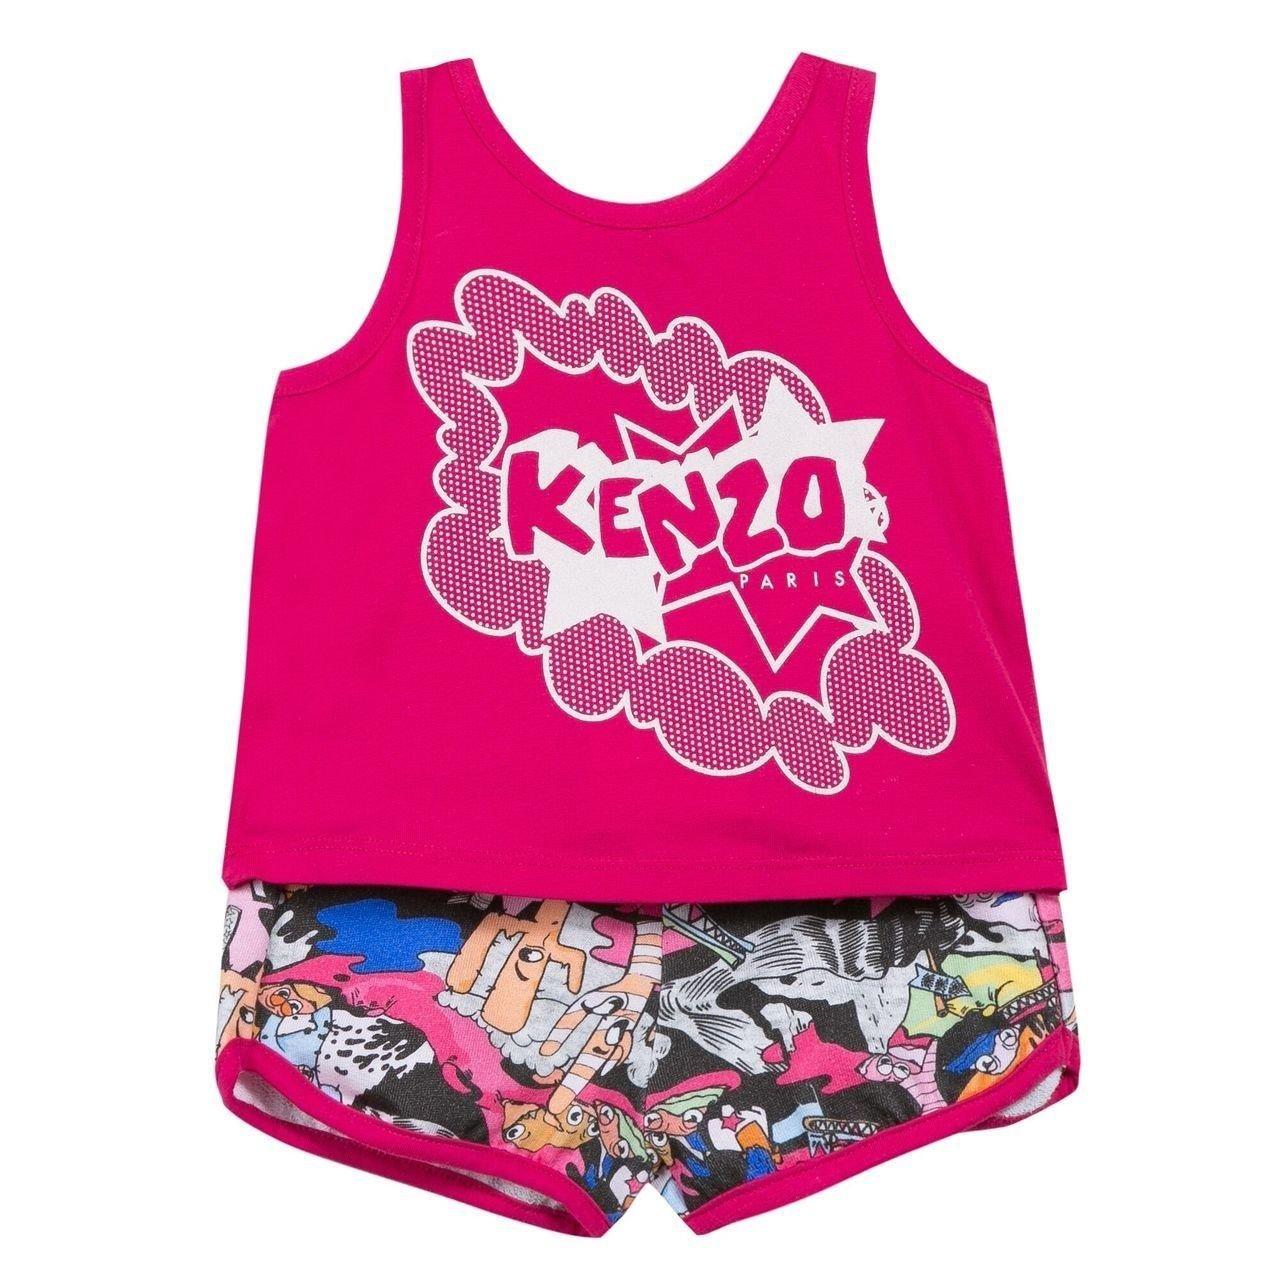 Kenzo Blush Set KJ37007